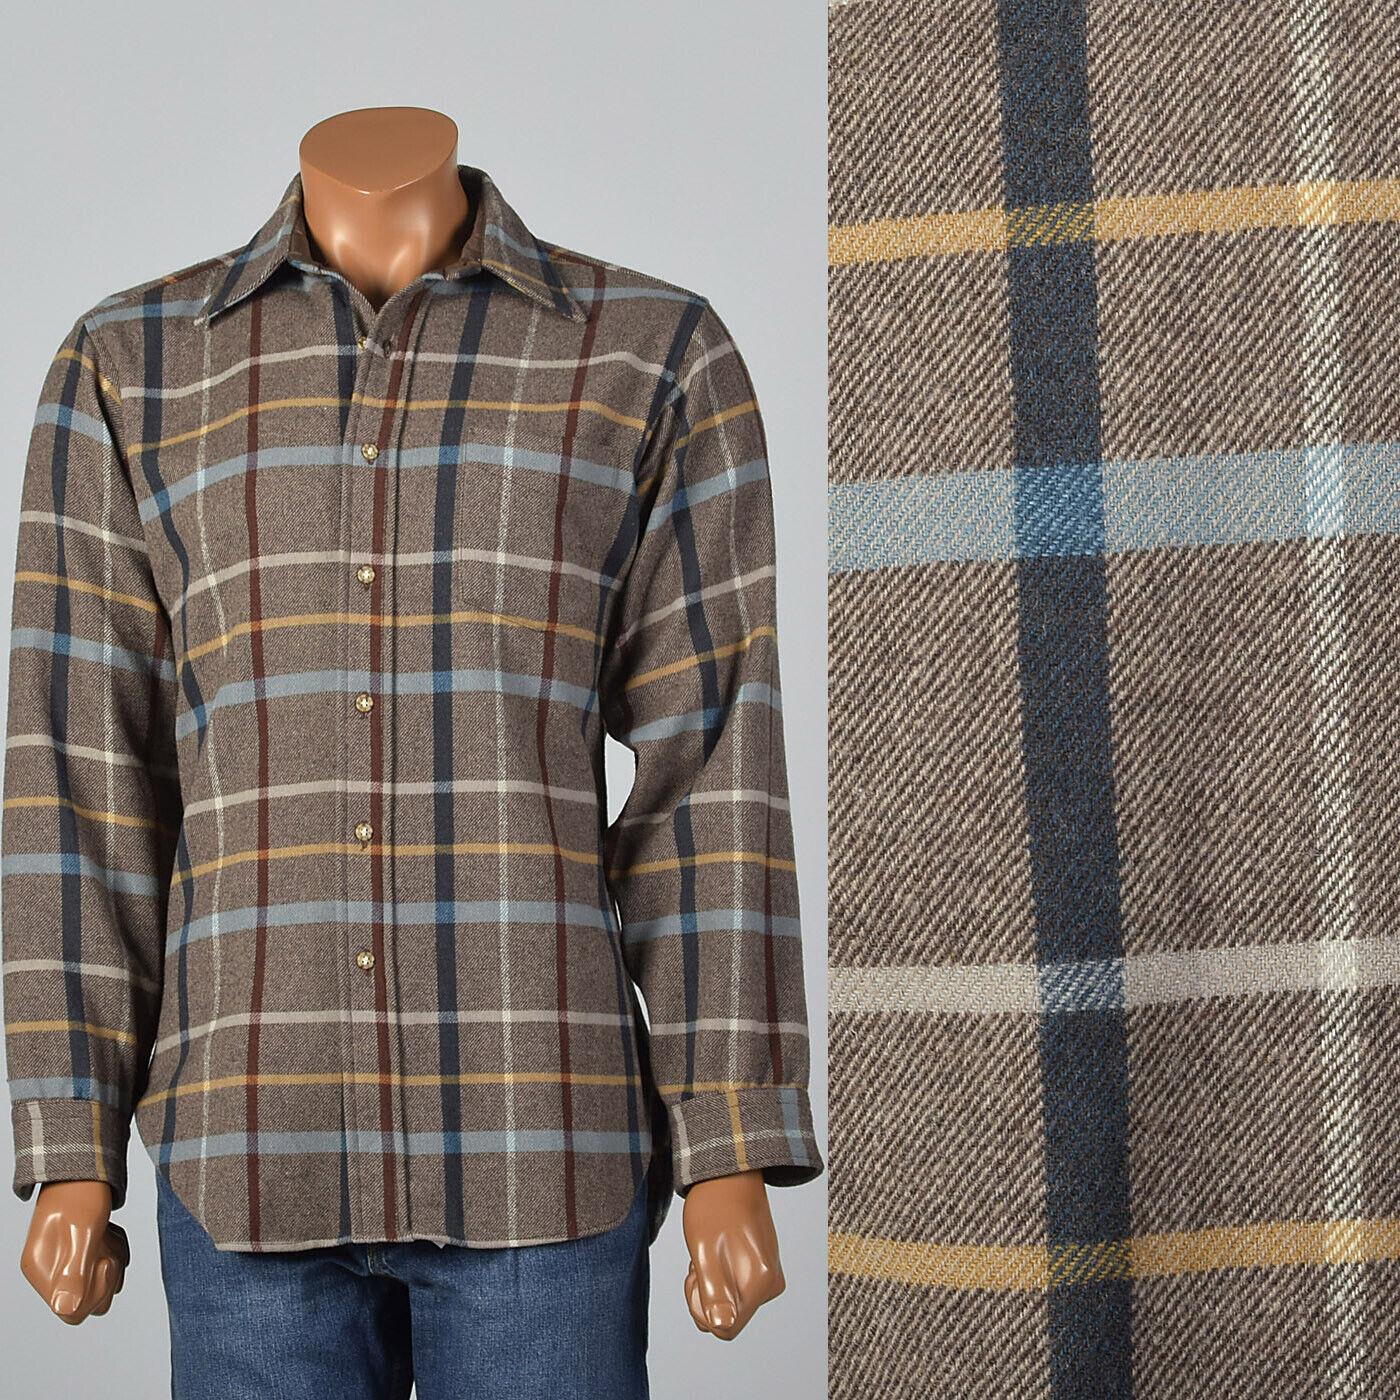 L 1960s Mens Pendleton Brown Plaid Shirt Long Sleeve Wool Separates 60s VTG